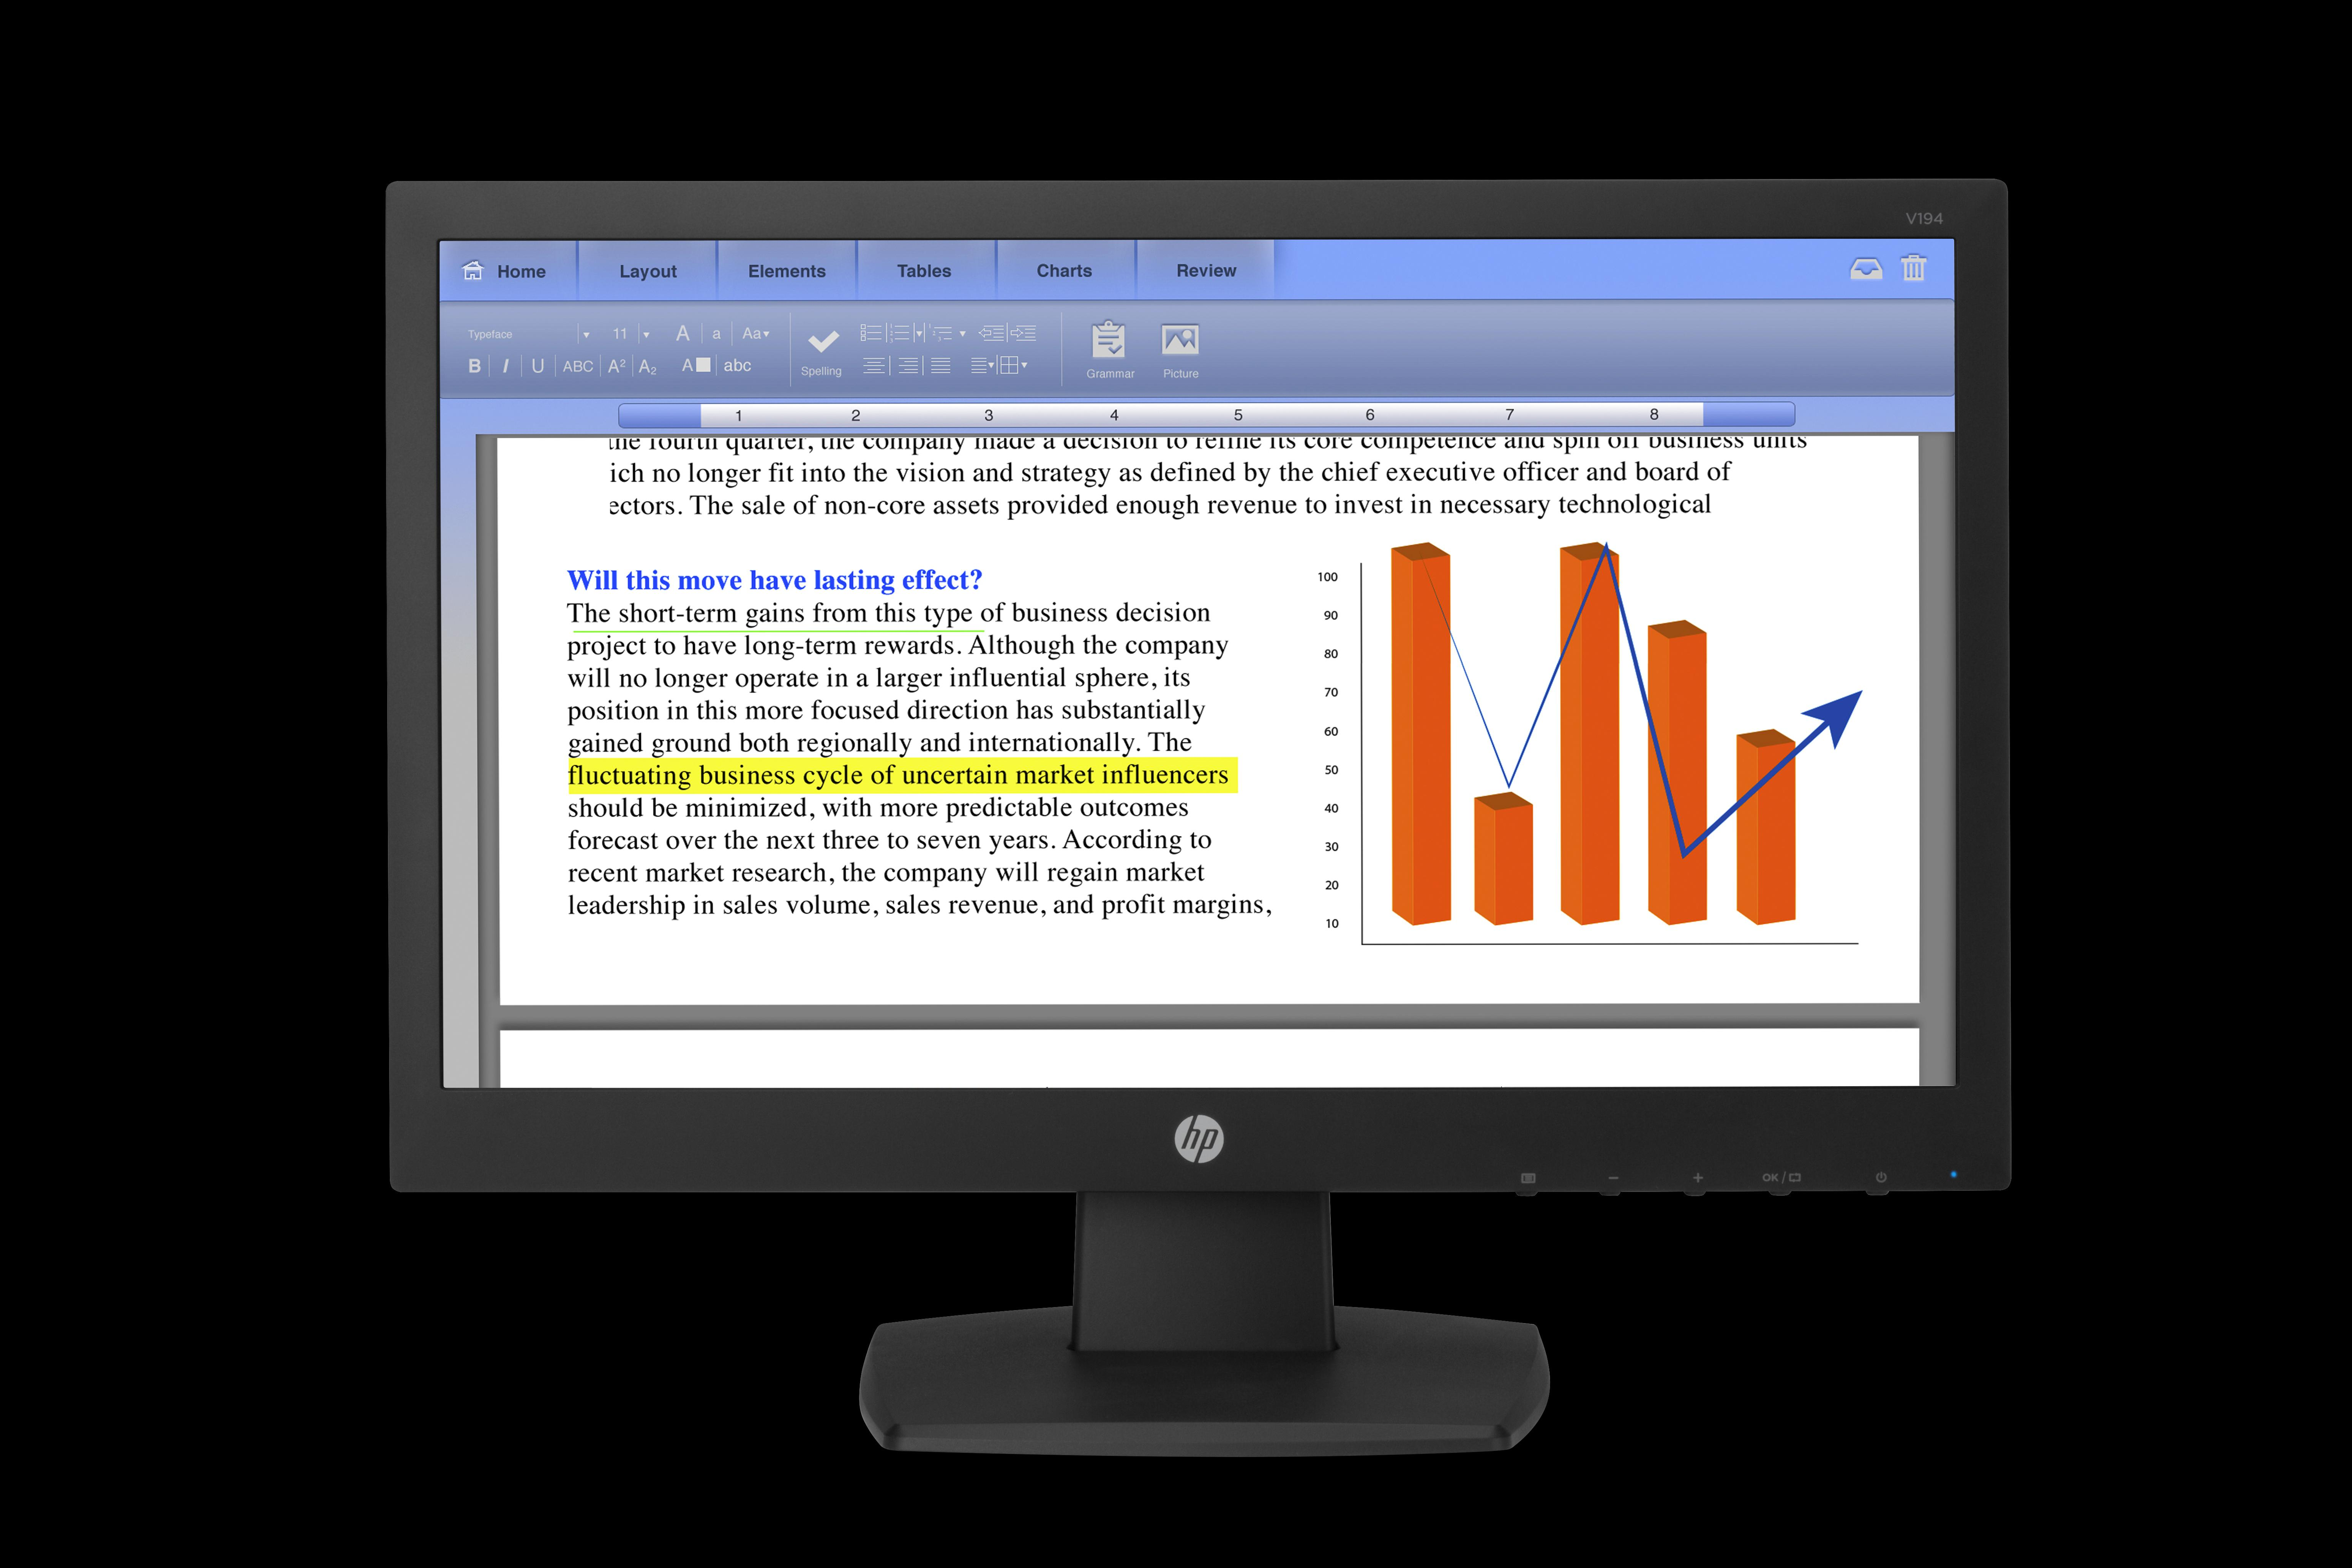 HP V194 18.5-inch 1366 x 768 Monitor